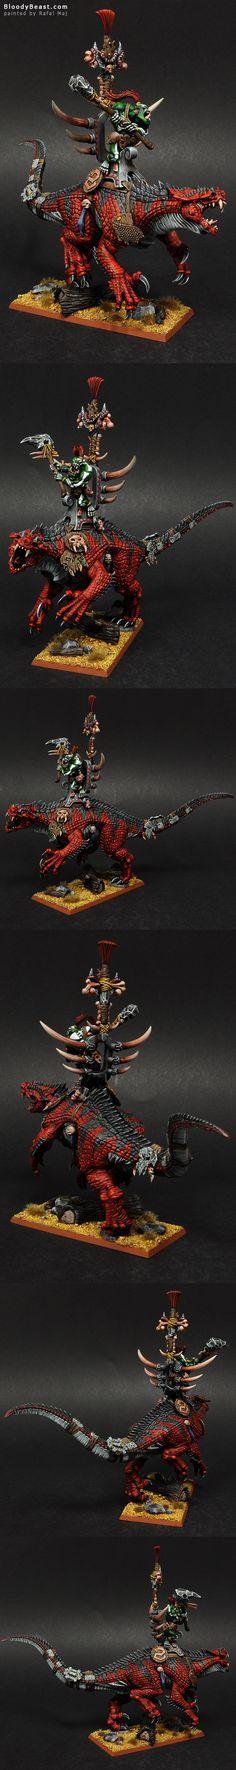 Savage Orc Warboss on Carnosaur painted by Rafal Maj (BloodyBeast.com)